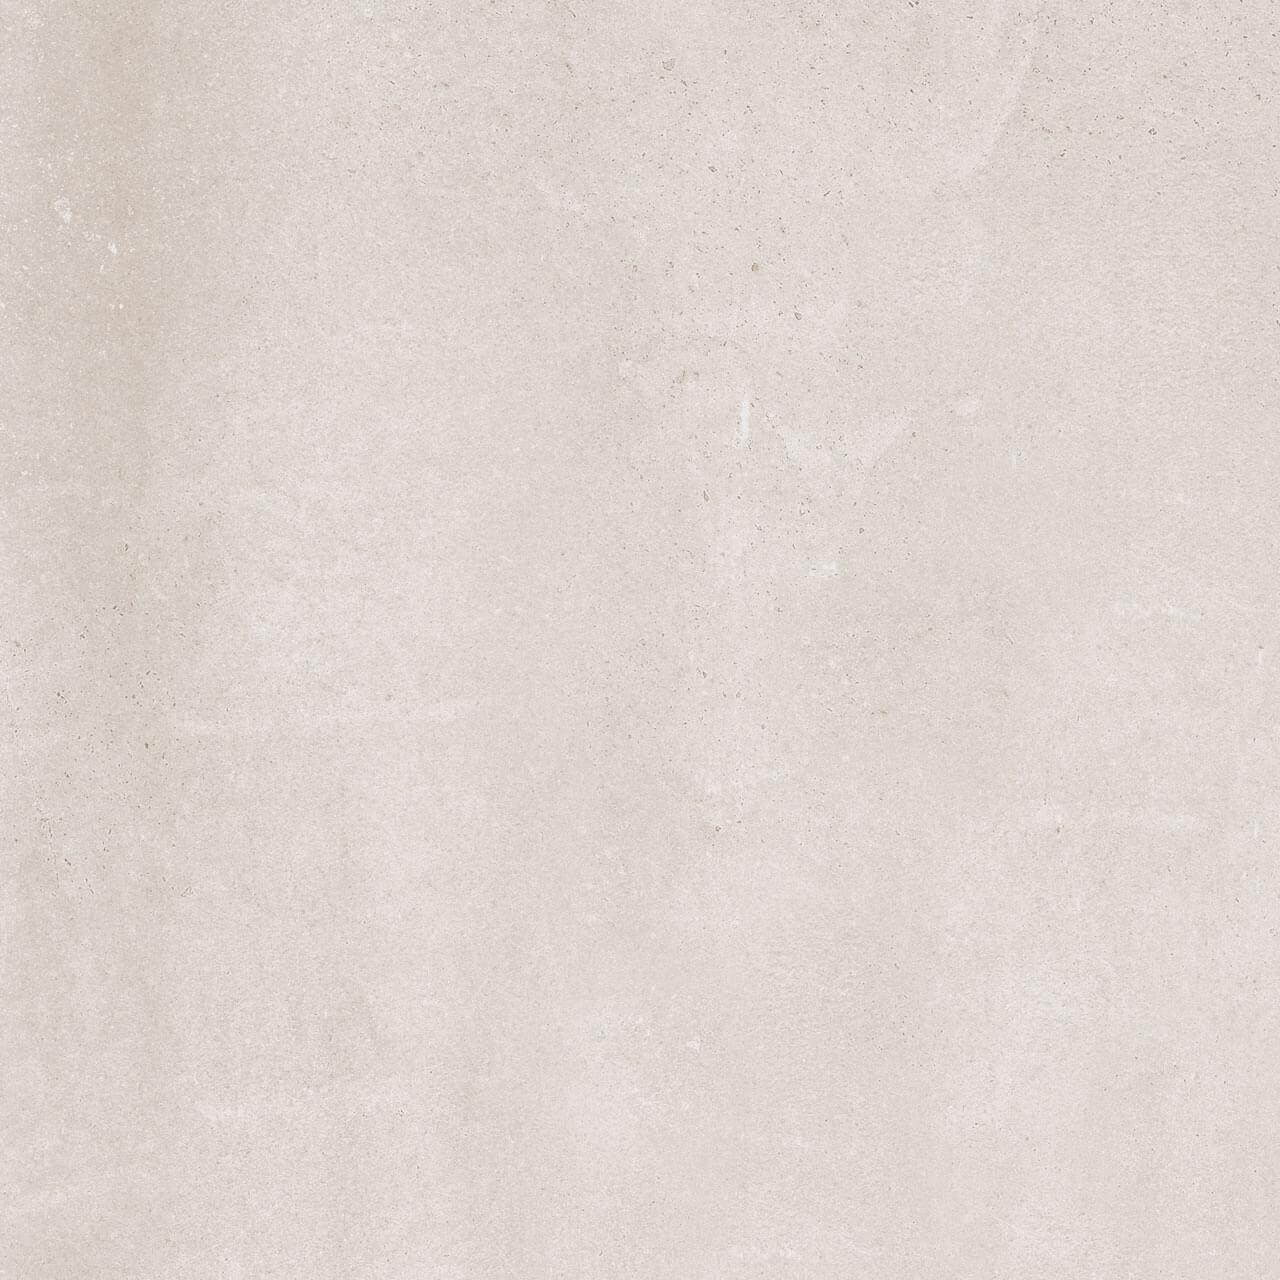 Munari Marfim Glazed Porcelain Non Rectified External Brazilian Floor Tile 4994